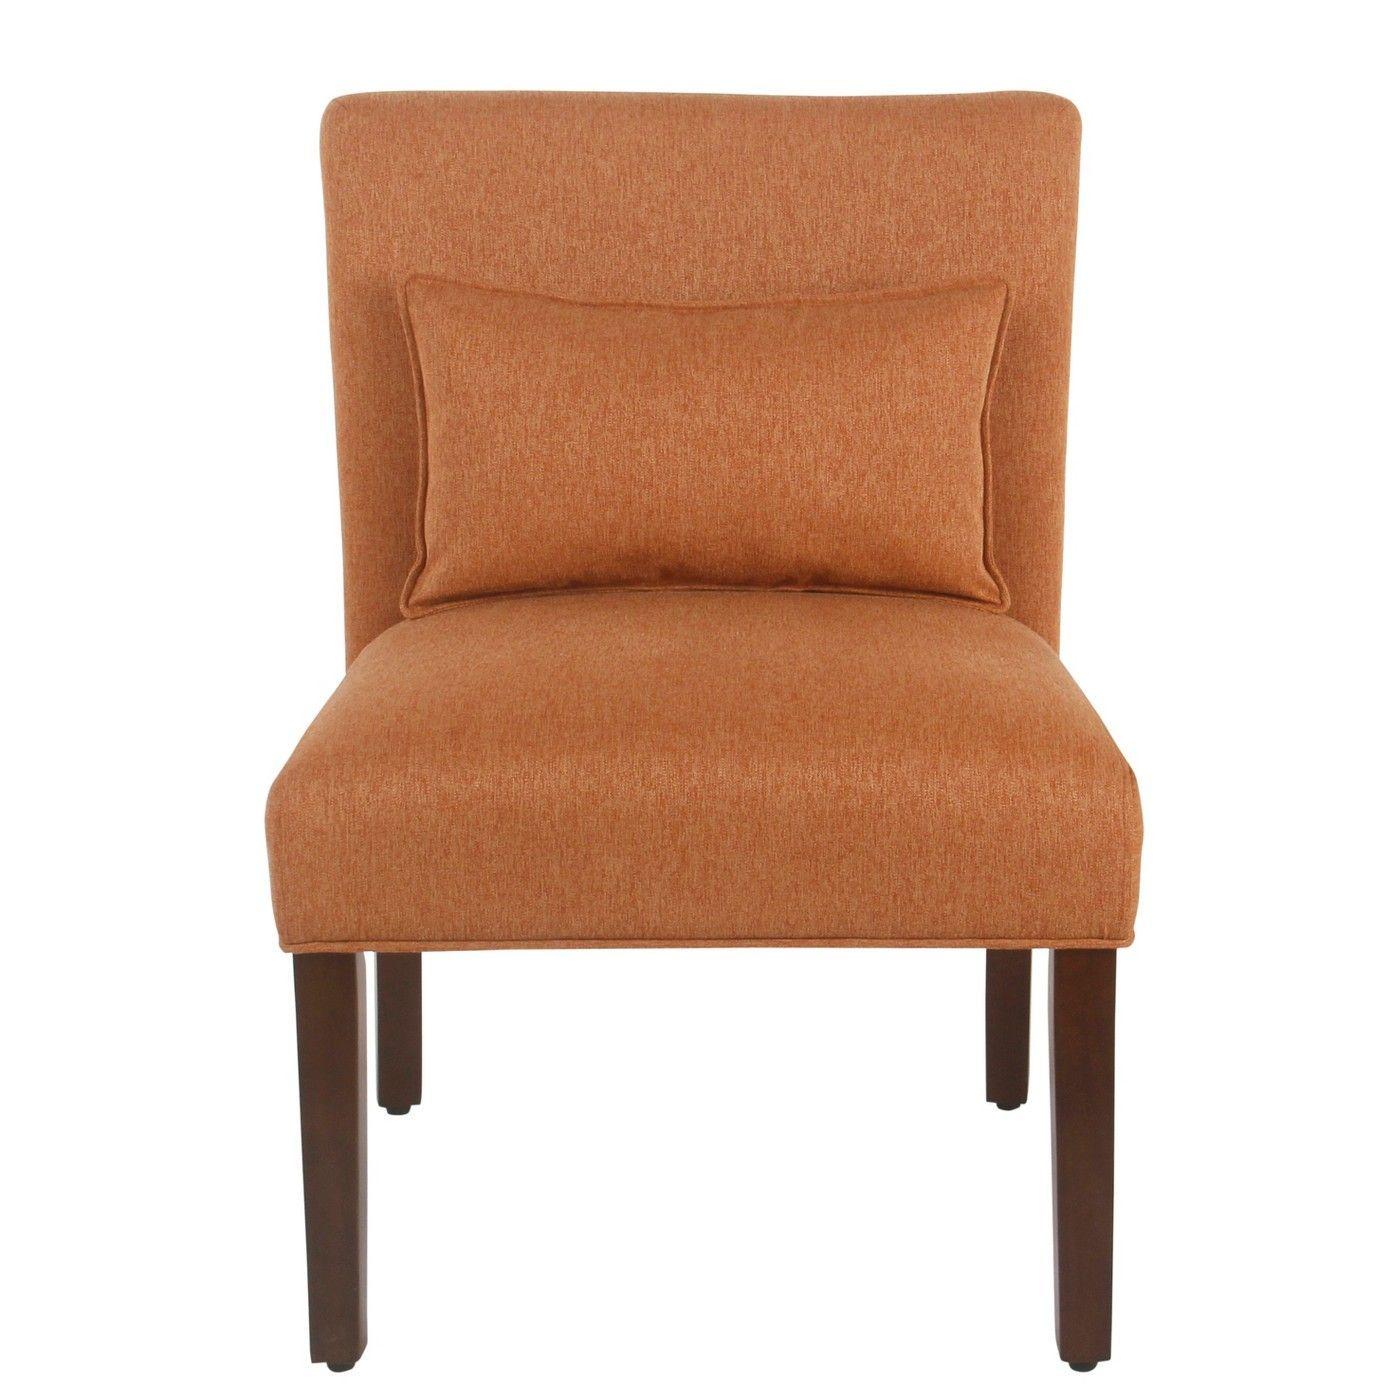 Parker accent chair target under 100 accentchairsunder100